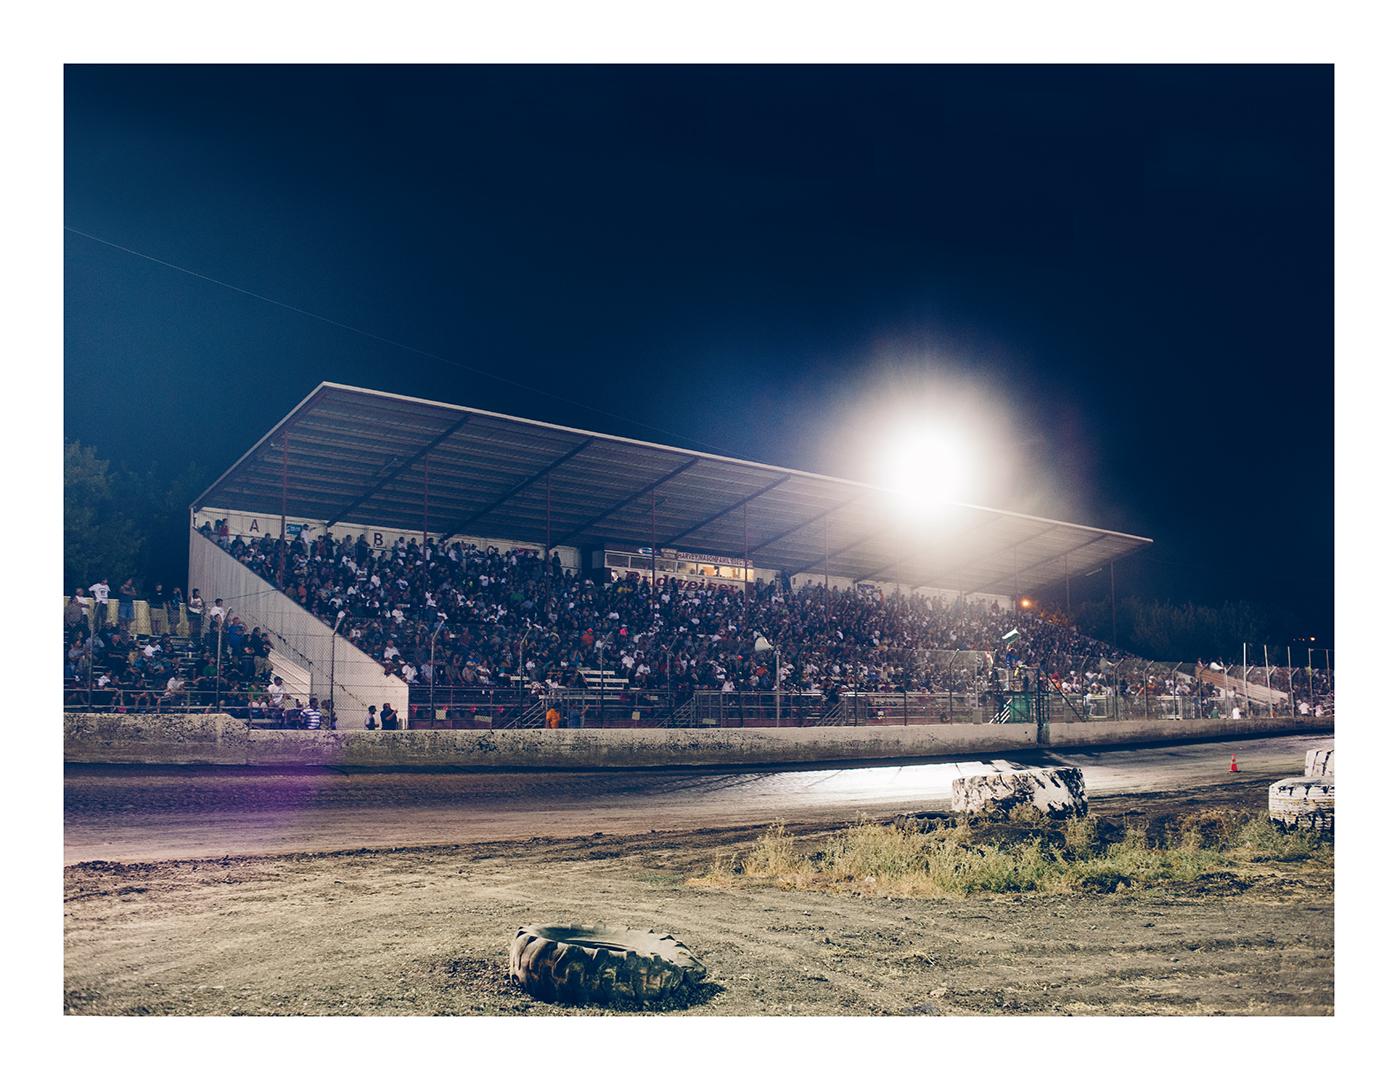 Antioch Speedway, Antioch, CA